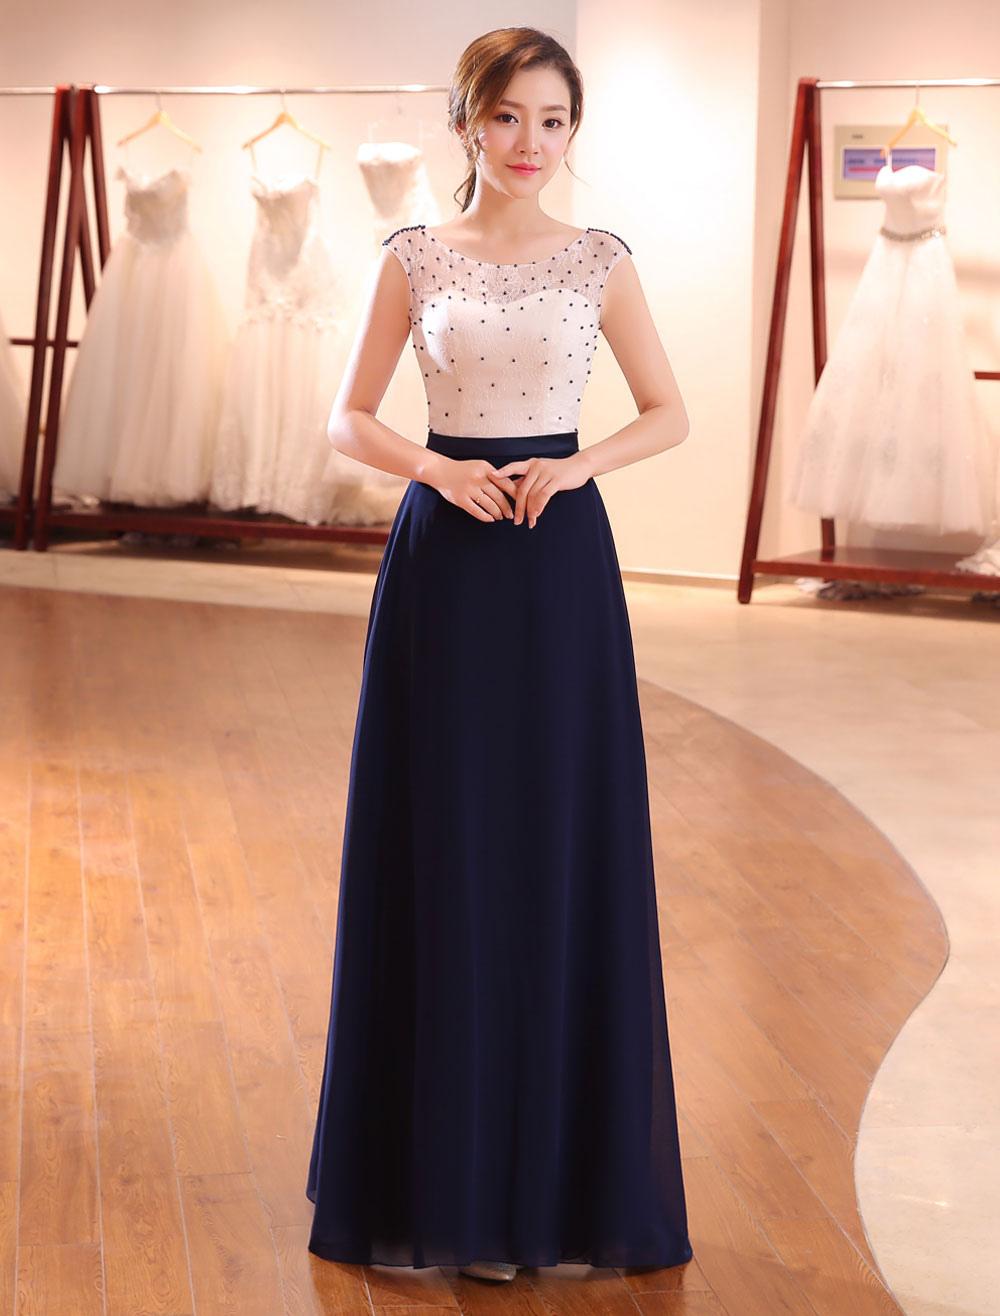 Evening Dresses Dark Navy Lace Formal Dress Illusion Beaded Contrast Color Floor Length Wedding Guest Dress